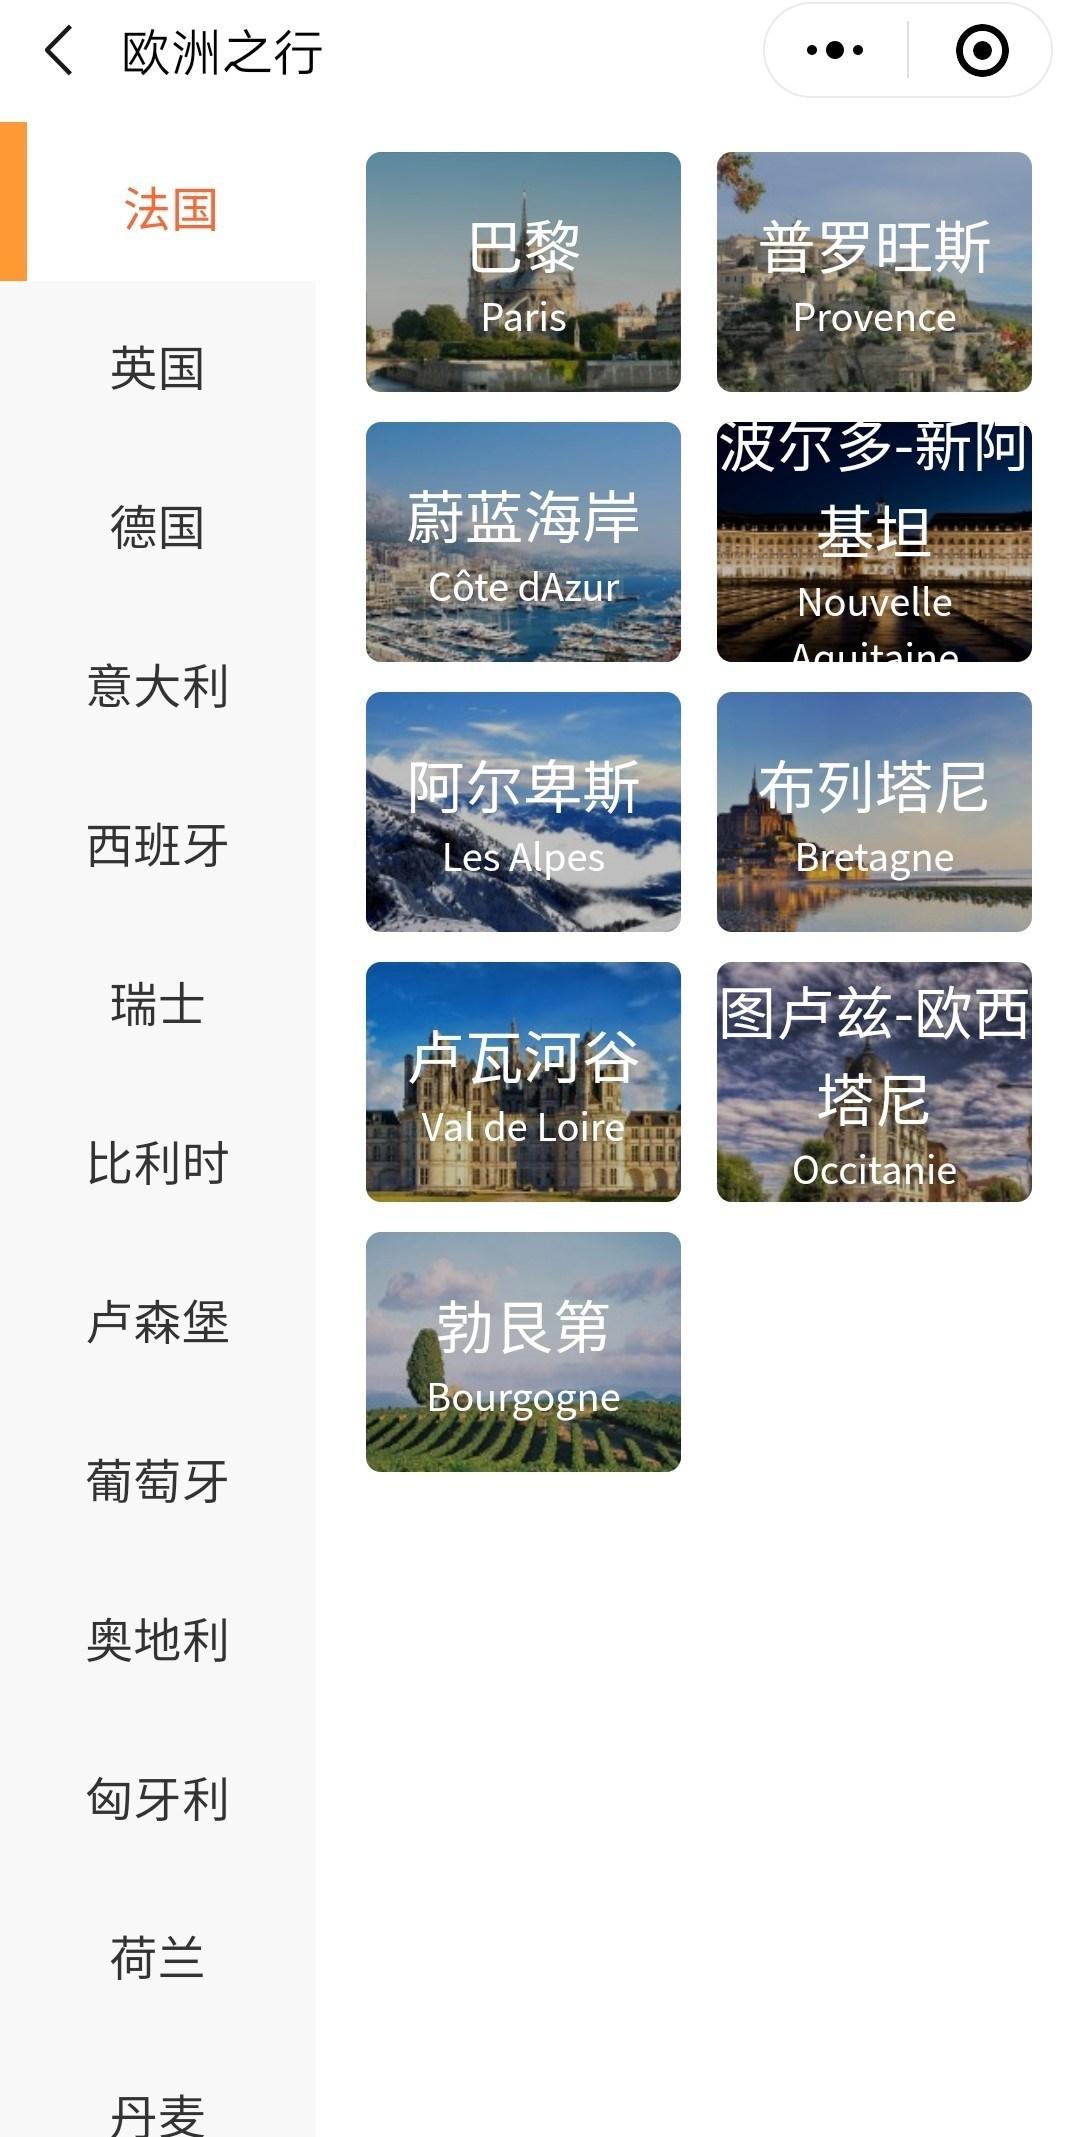 France Tourism Wechat Mini-Program - WeChat Travel Experience - EuroPass